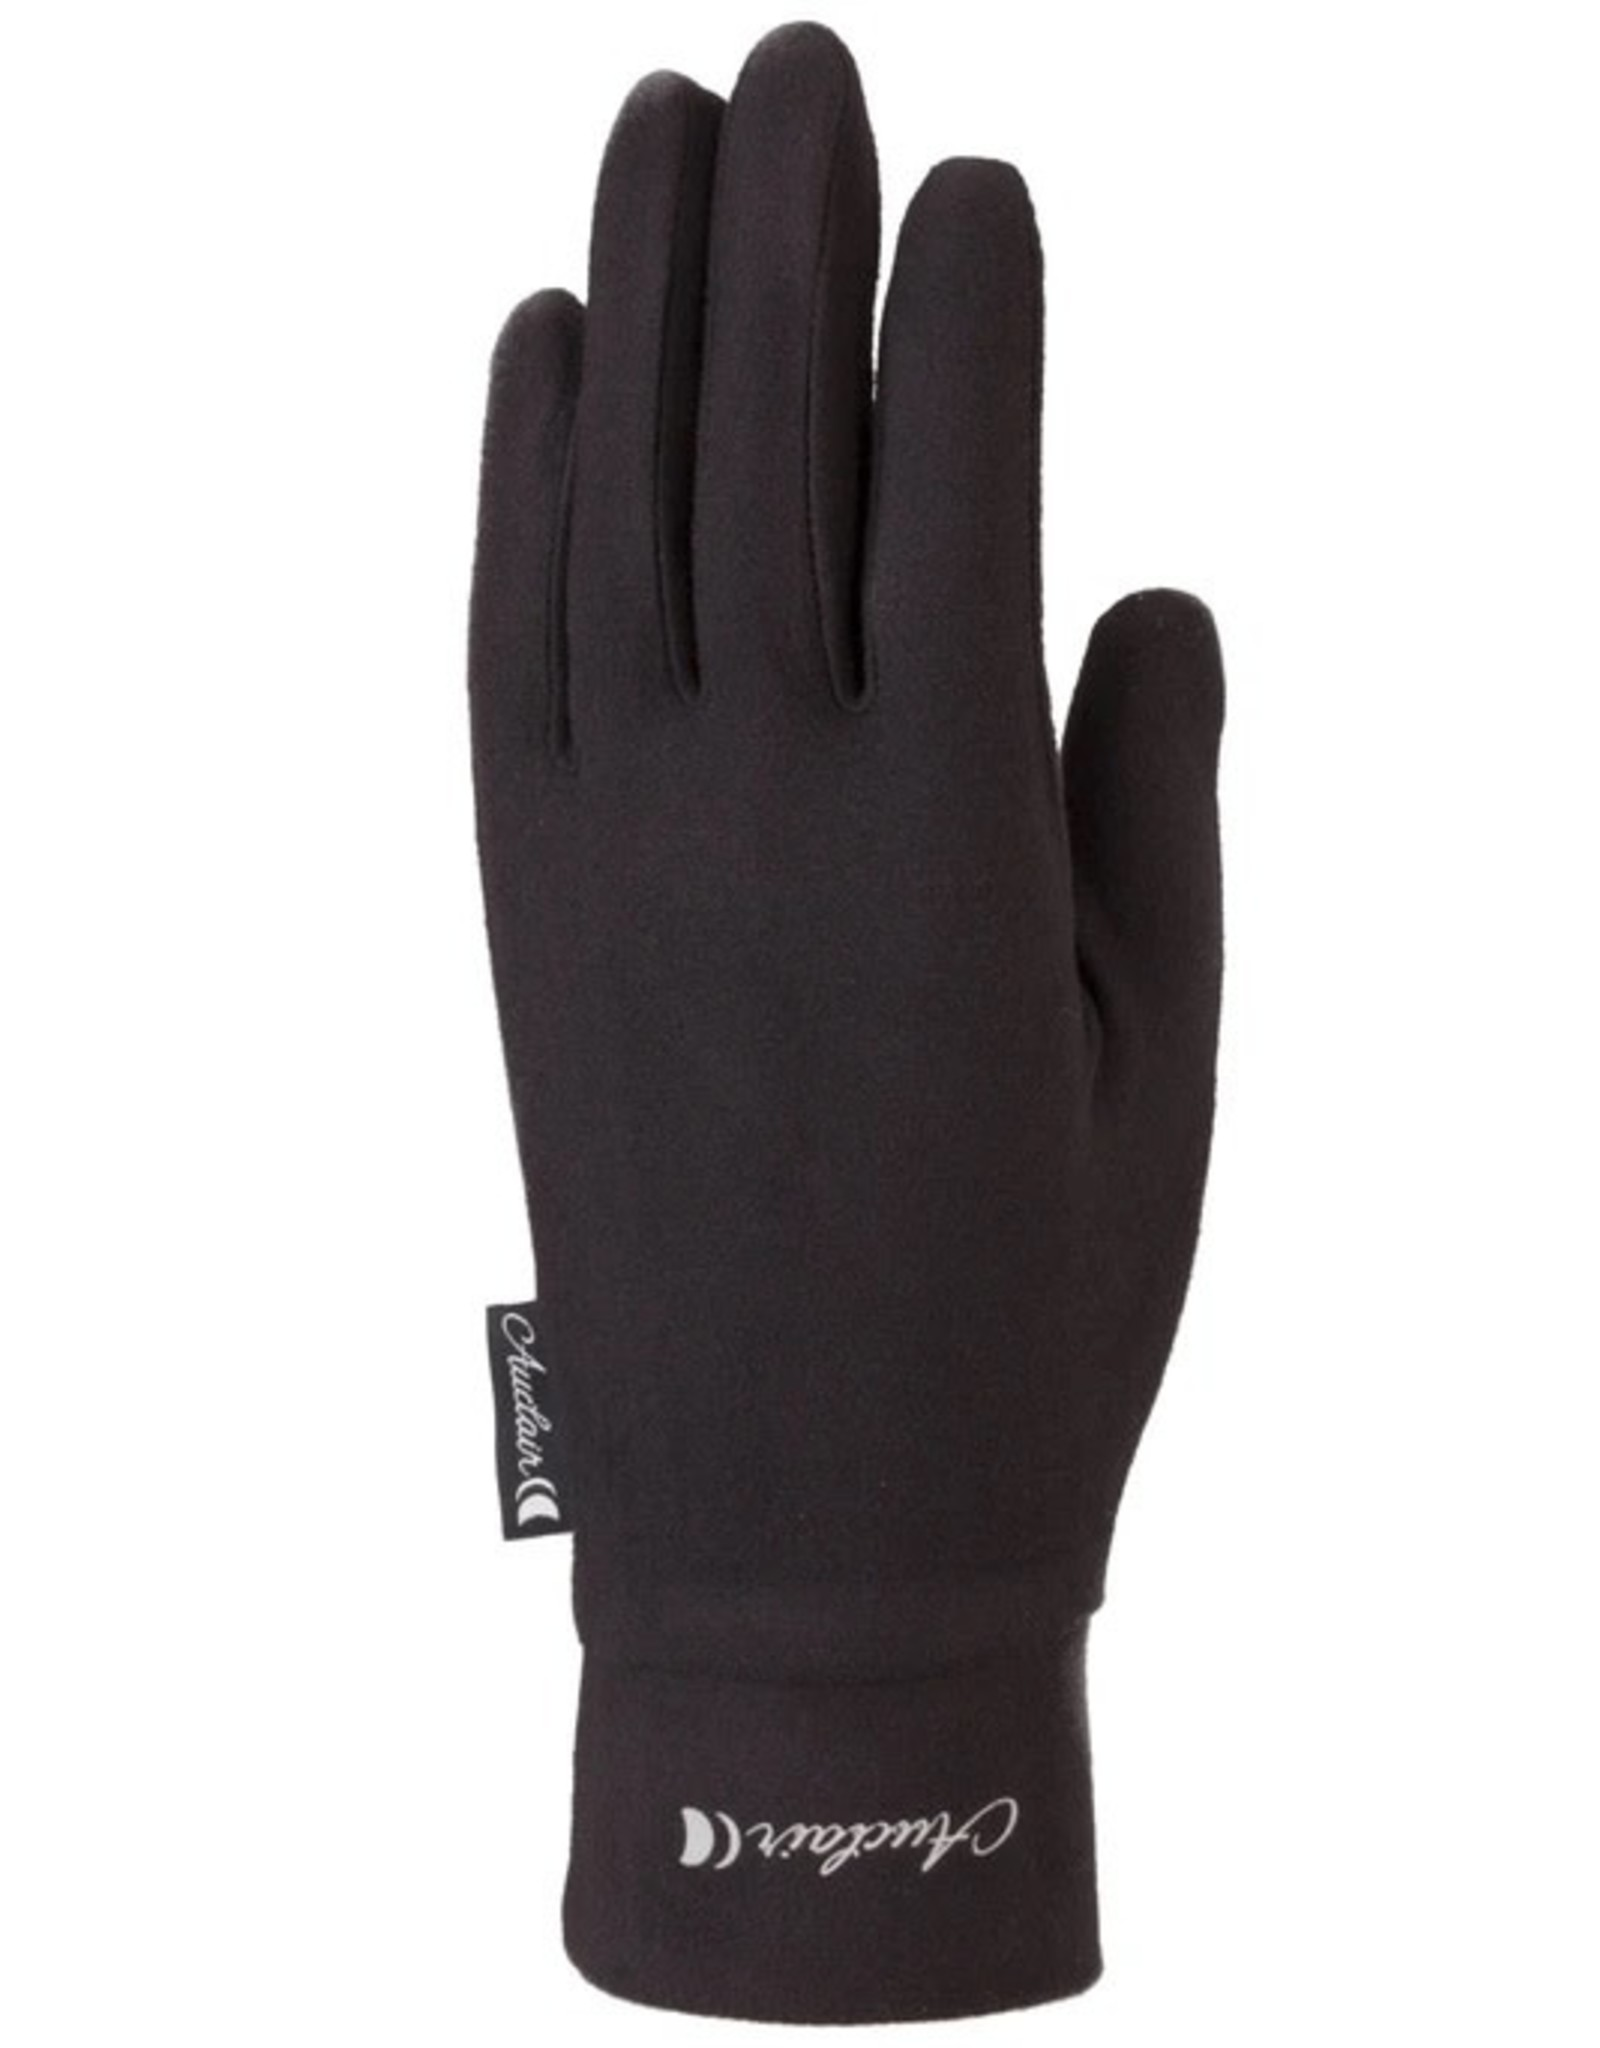 Auclair '22, AUCLAIR, Wool Blend Liner Glove, Women's, Black